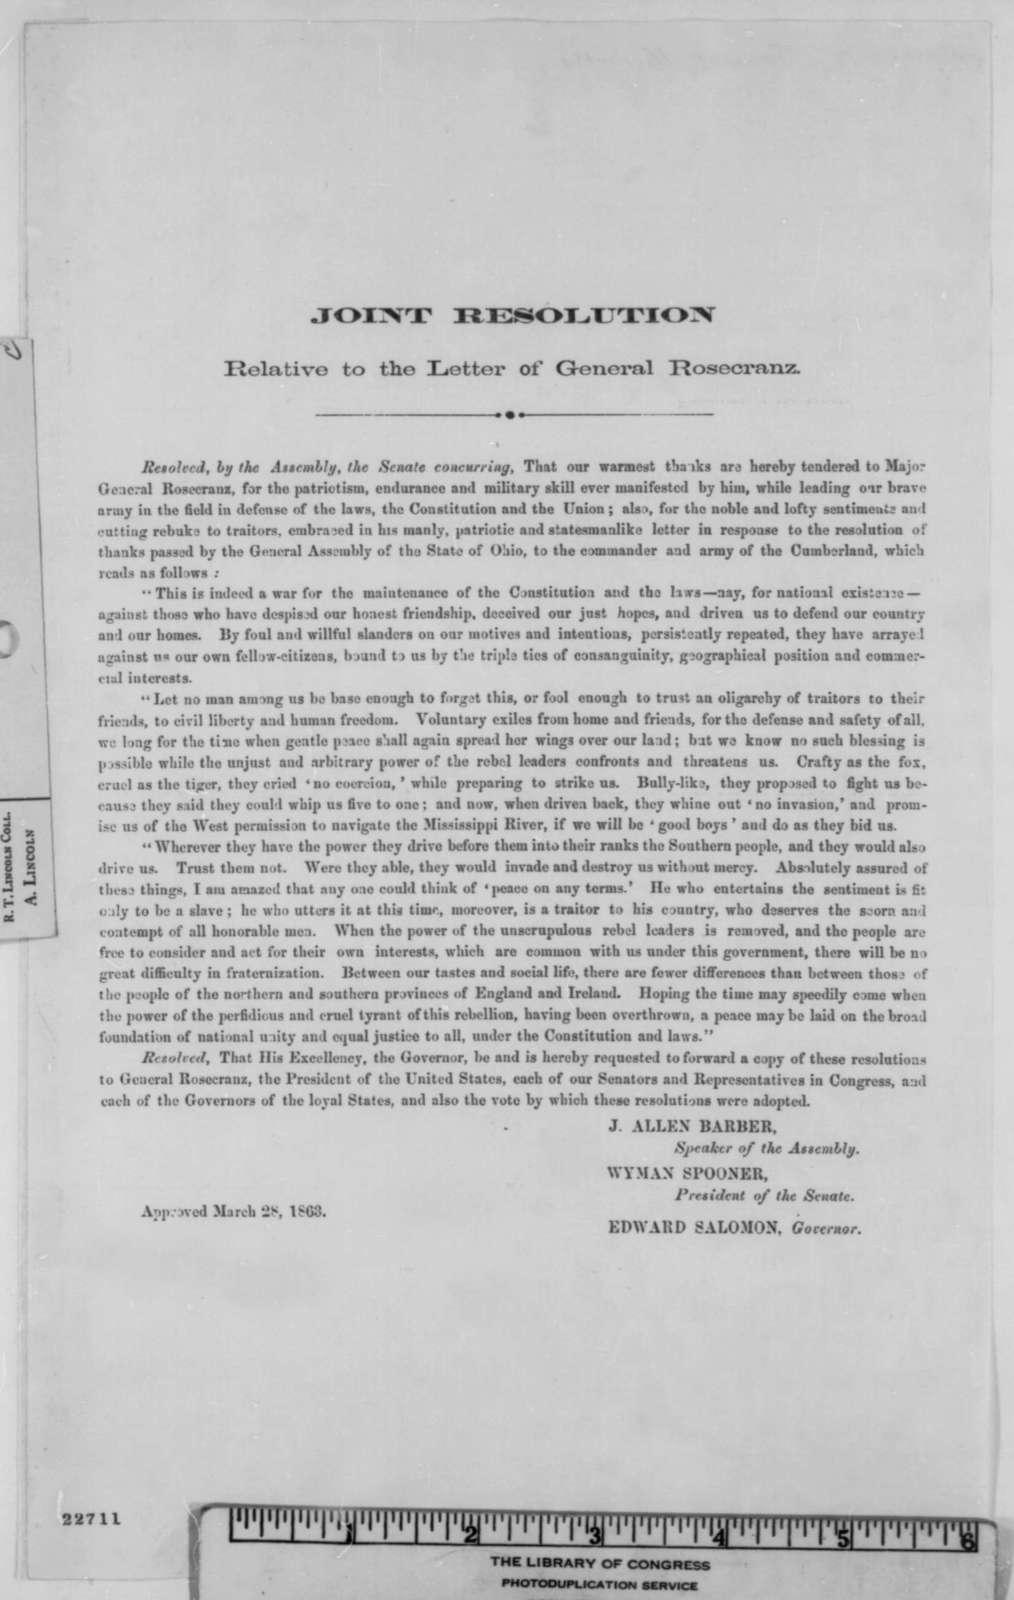 Wisconsin Legislature, Saturday, March 28, 1863  (Printed Resolution)